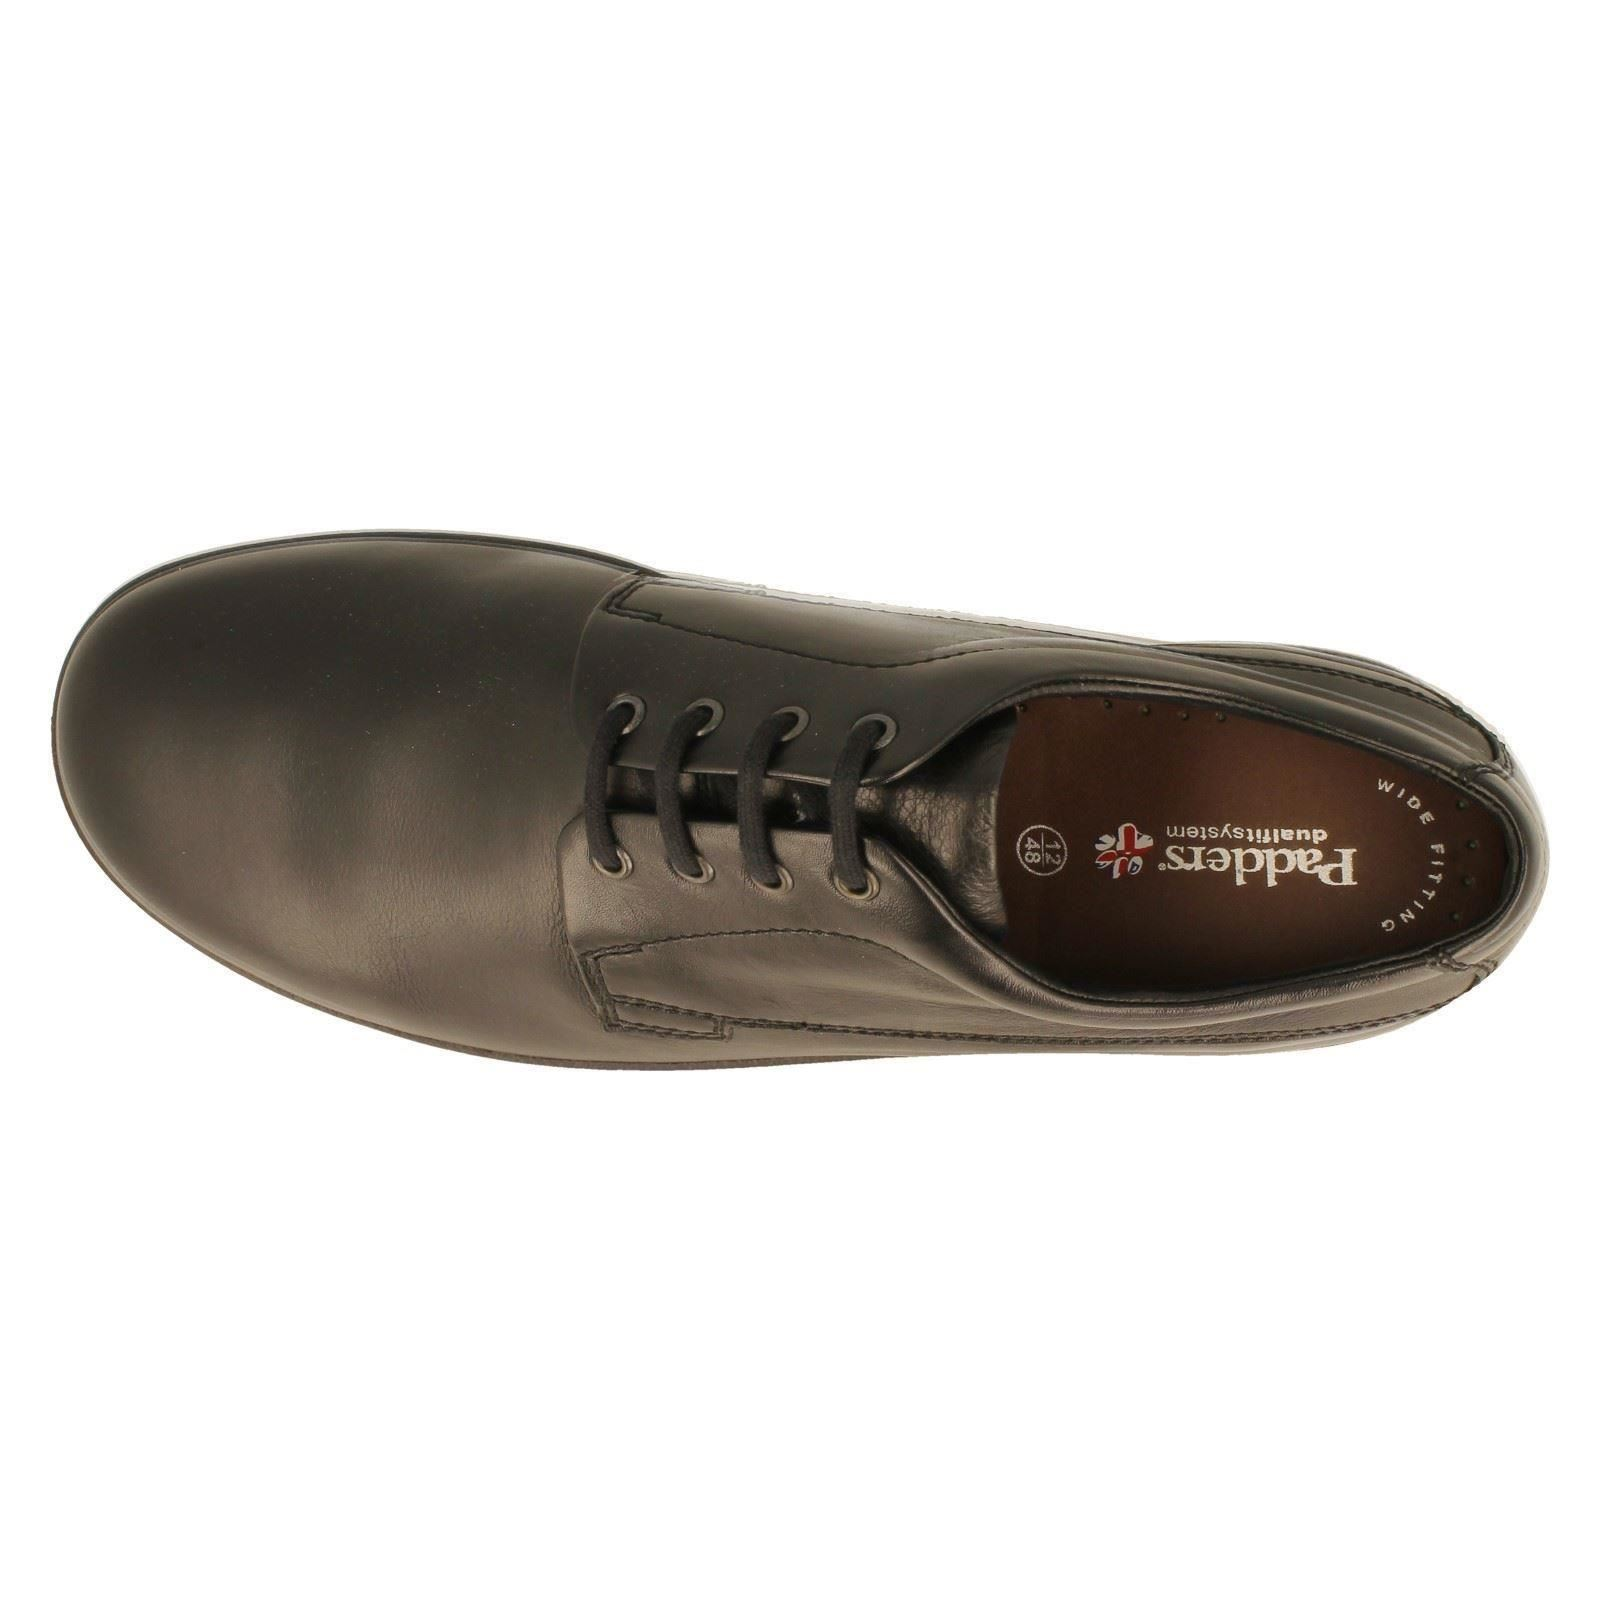 Herren Padders Lunar-W Lace Up Schuhes G/H Fit Label Lunar-W Padders c4292d